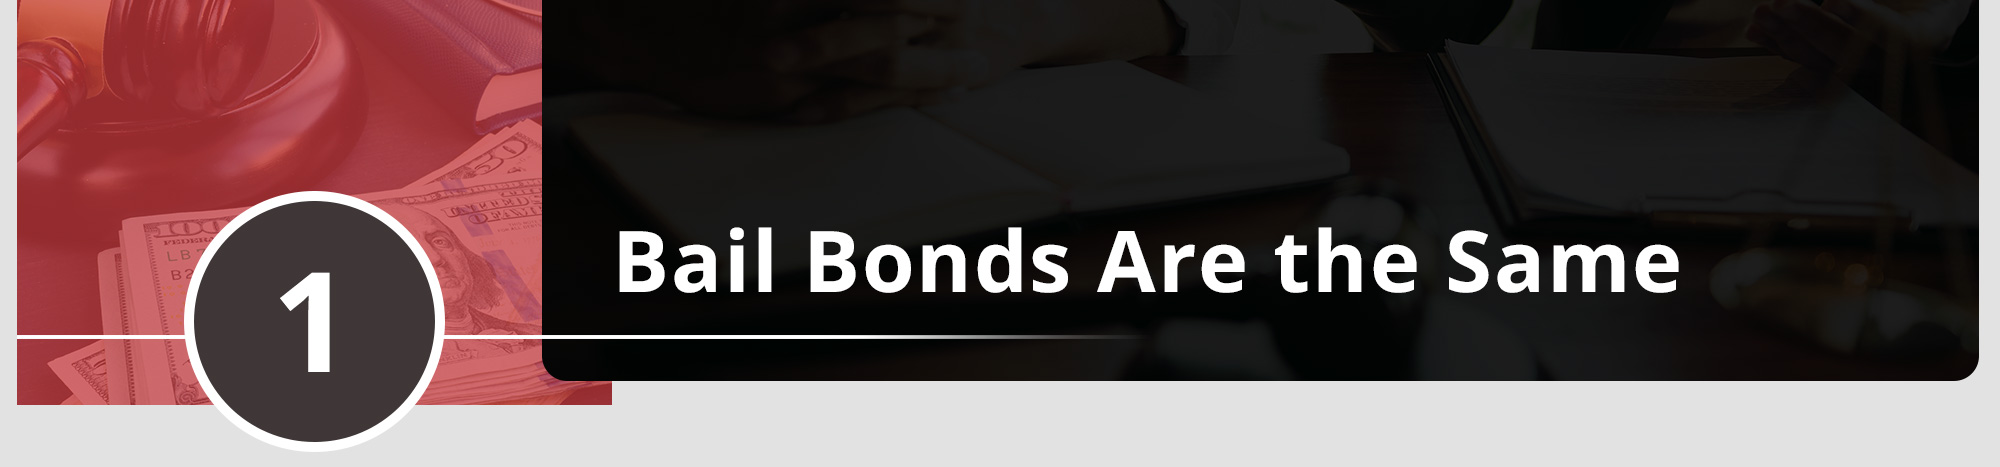 Bail Bonds Are the Same